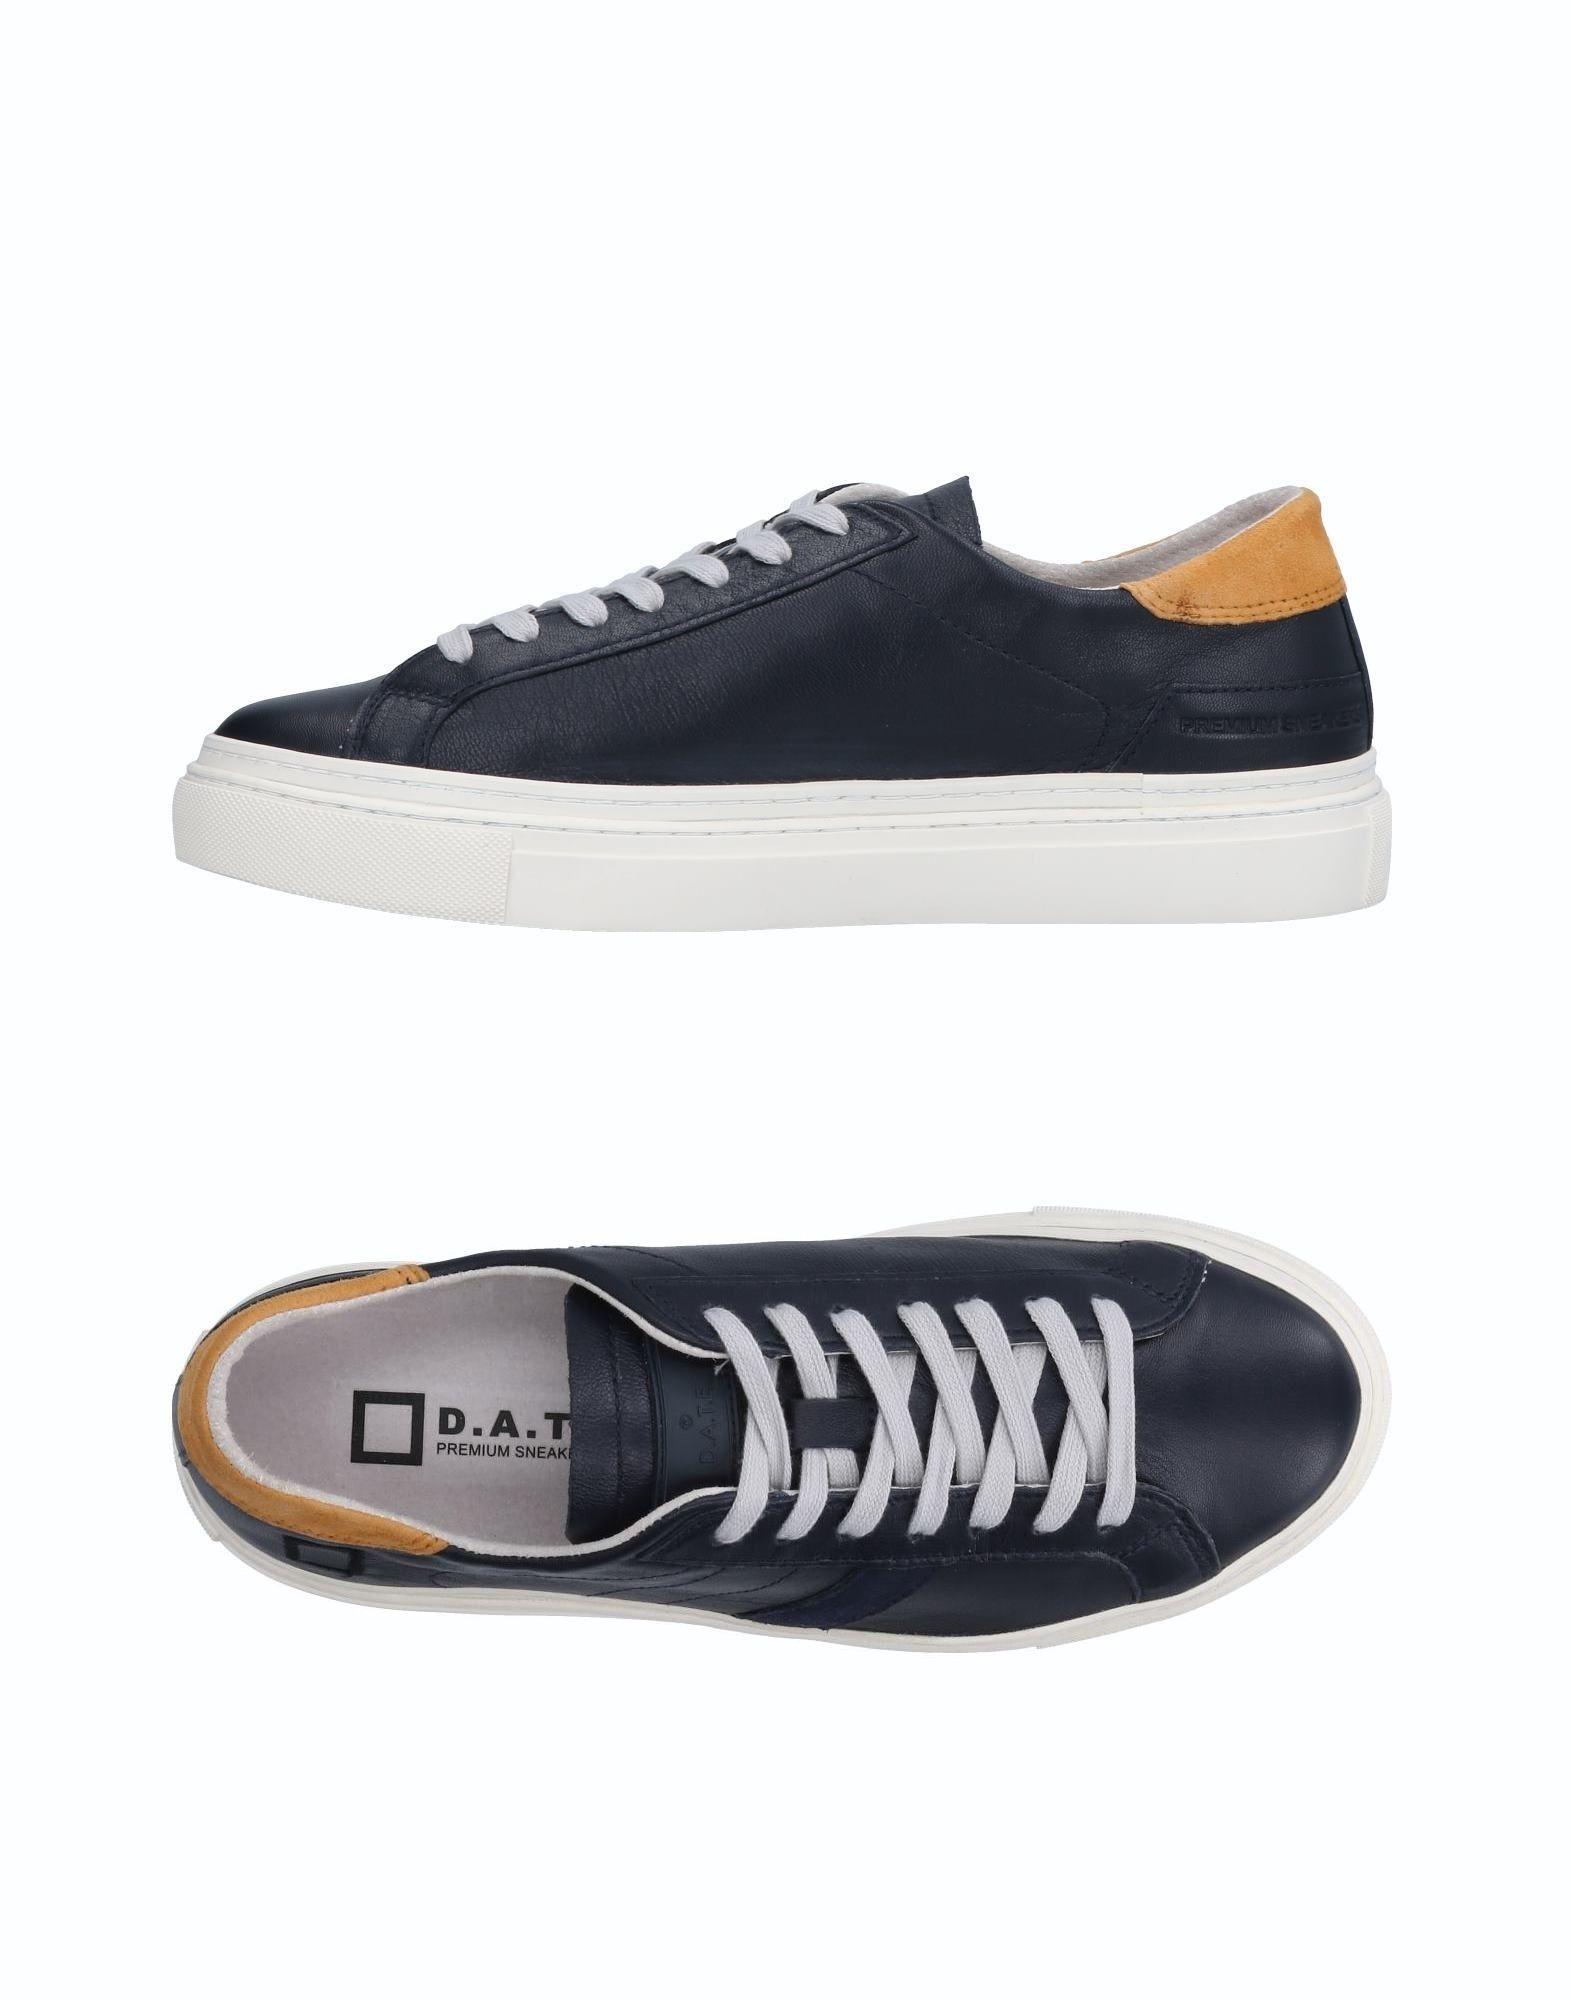 Rabatt echte Schuhe D.A.T.E. Sneakers 11519184BV Herren  11519184BV Sneakers c5bbb9